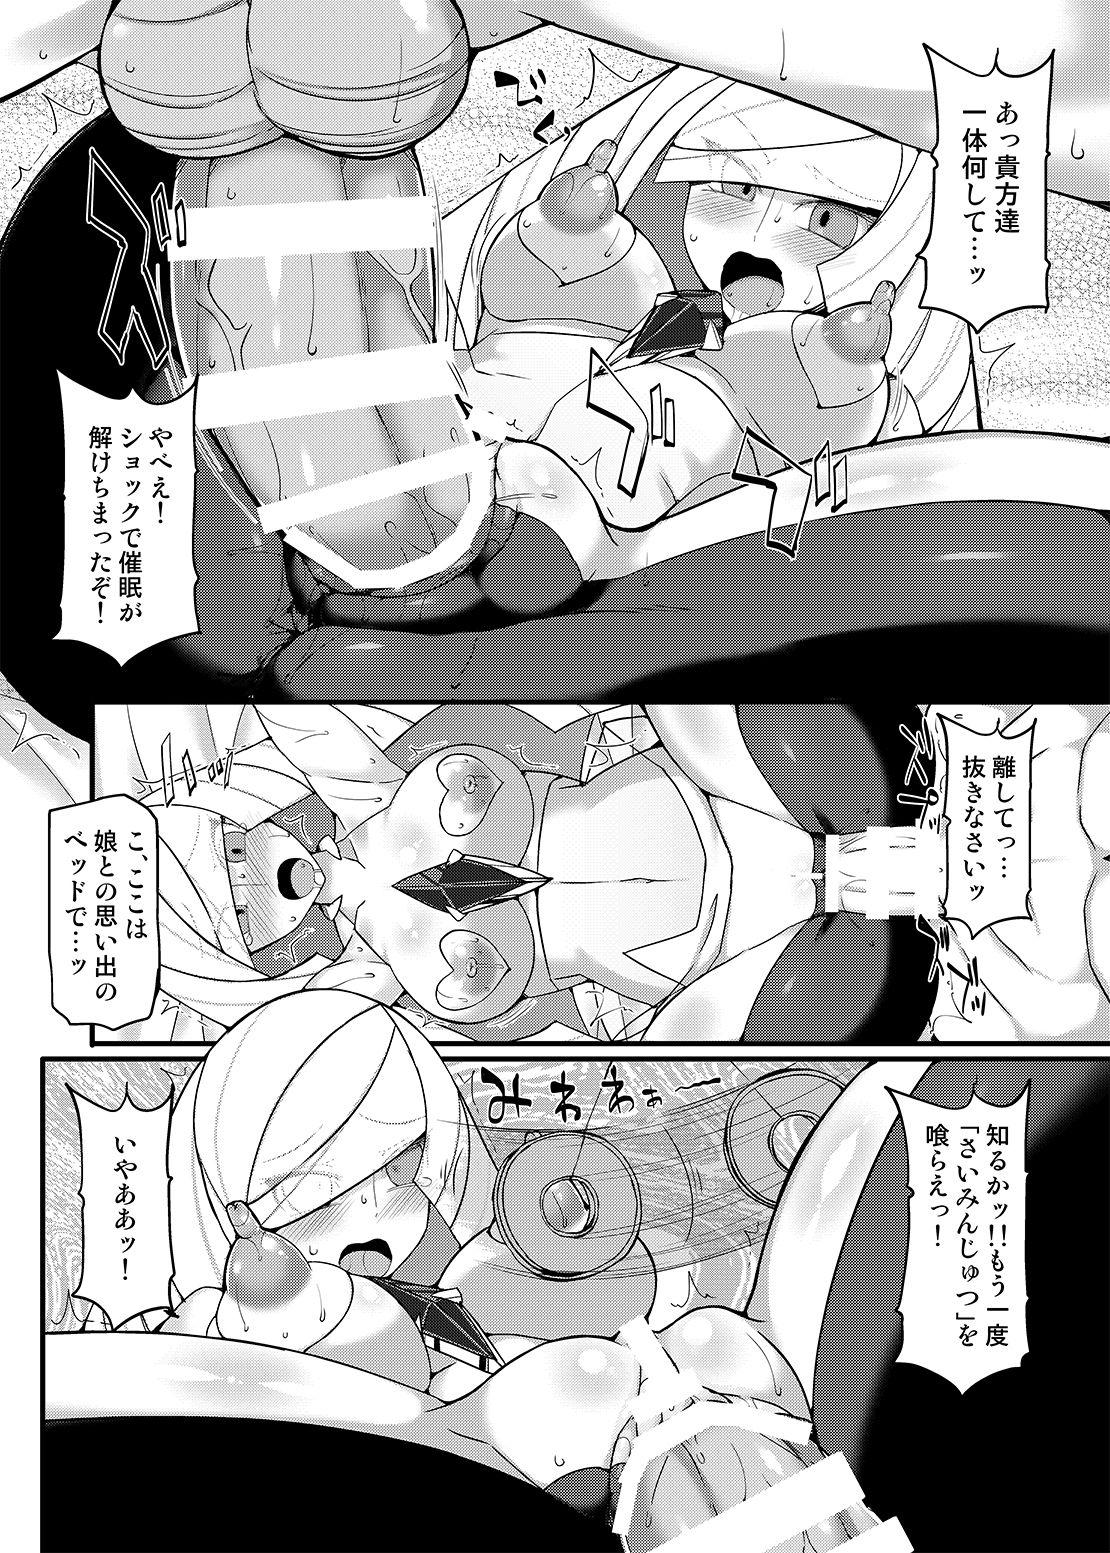 [Stapspats (Hisui)] Stapspats [Pocket Monster Saimin Series Soushuuhen] 1 Collective Hypnosis (Pokémon) [Digital] 69